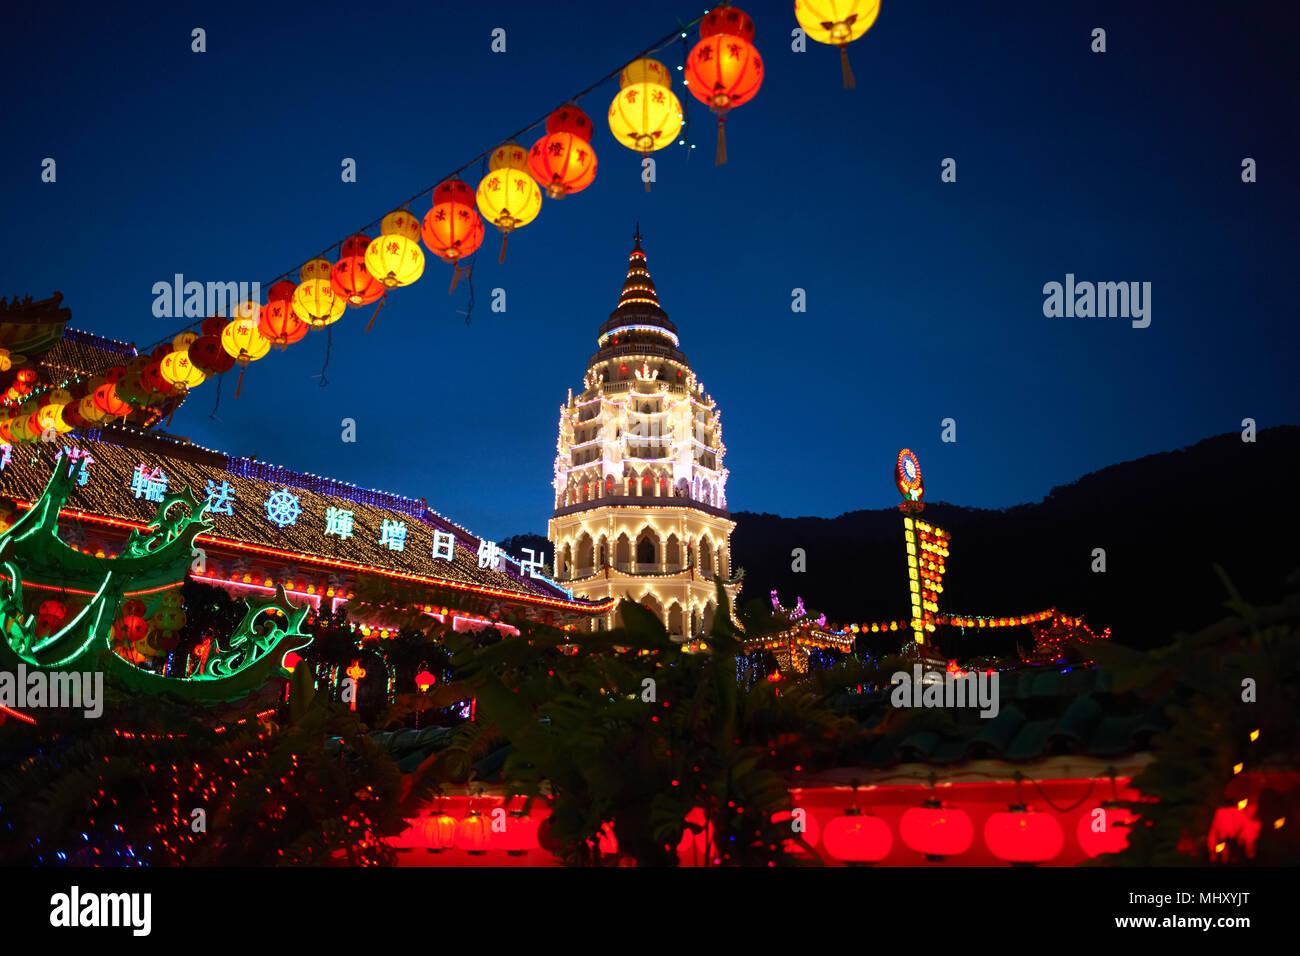 Fila di lanterne di carta e Tempio di Kek Lok Si accese di notte, Penang Pulau Pinang, Malaysia Immagini Stock